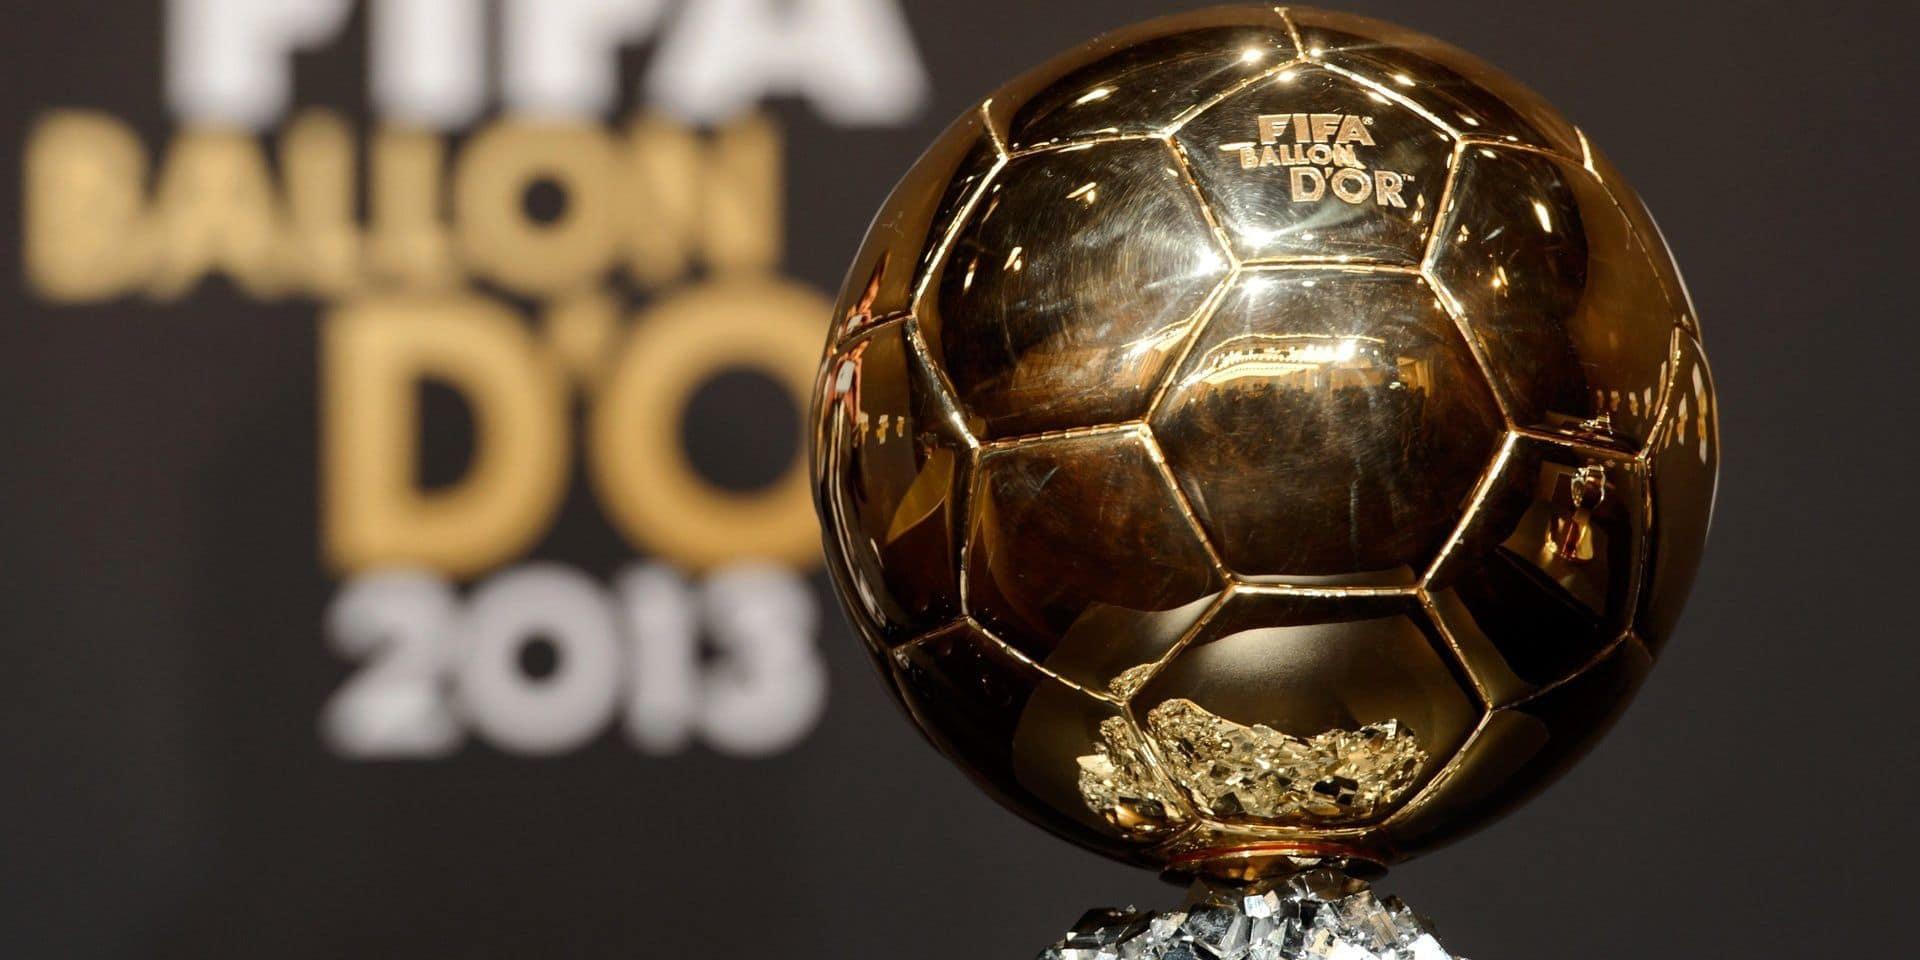 Le Ballon d'Or ne sera pas décerné en 2020